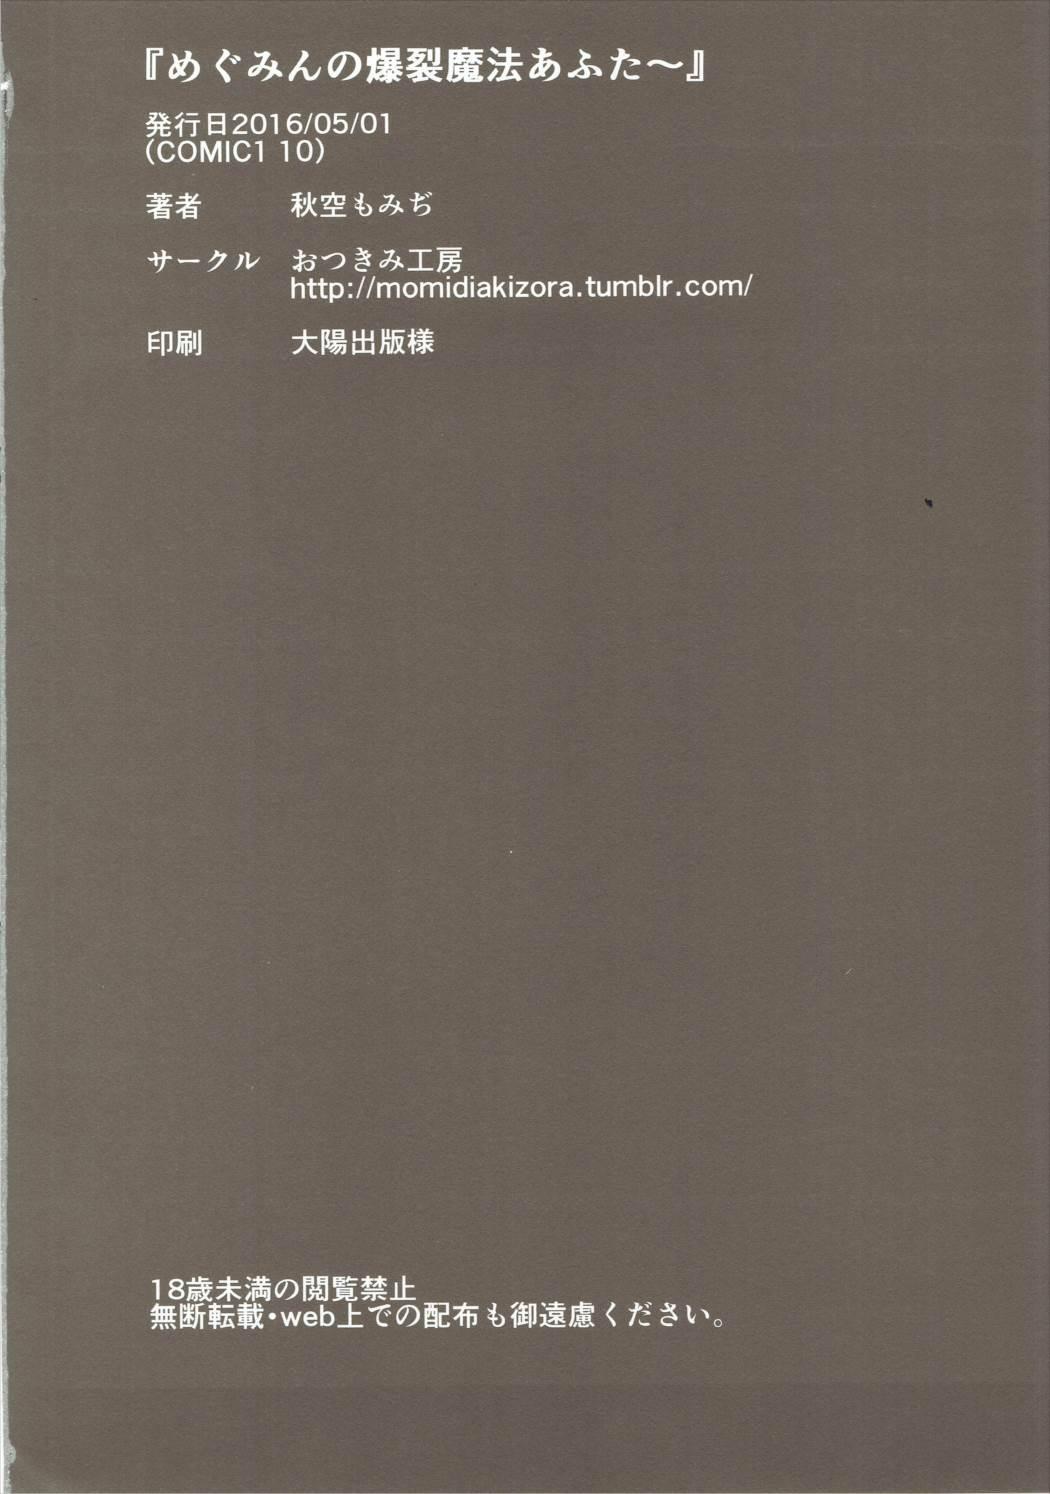 Megumin no Bakuretsu Mahou After 20